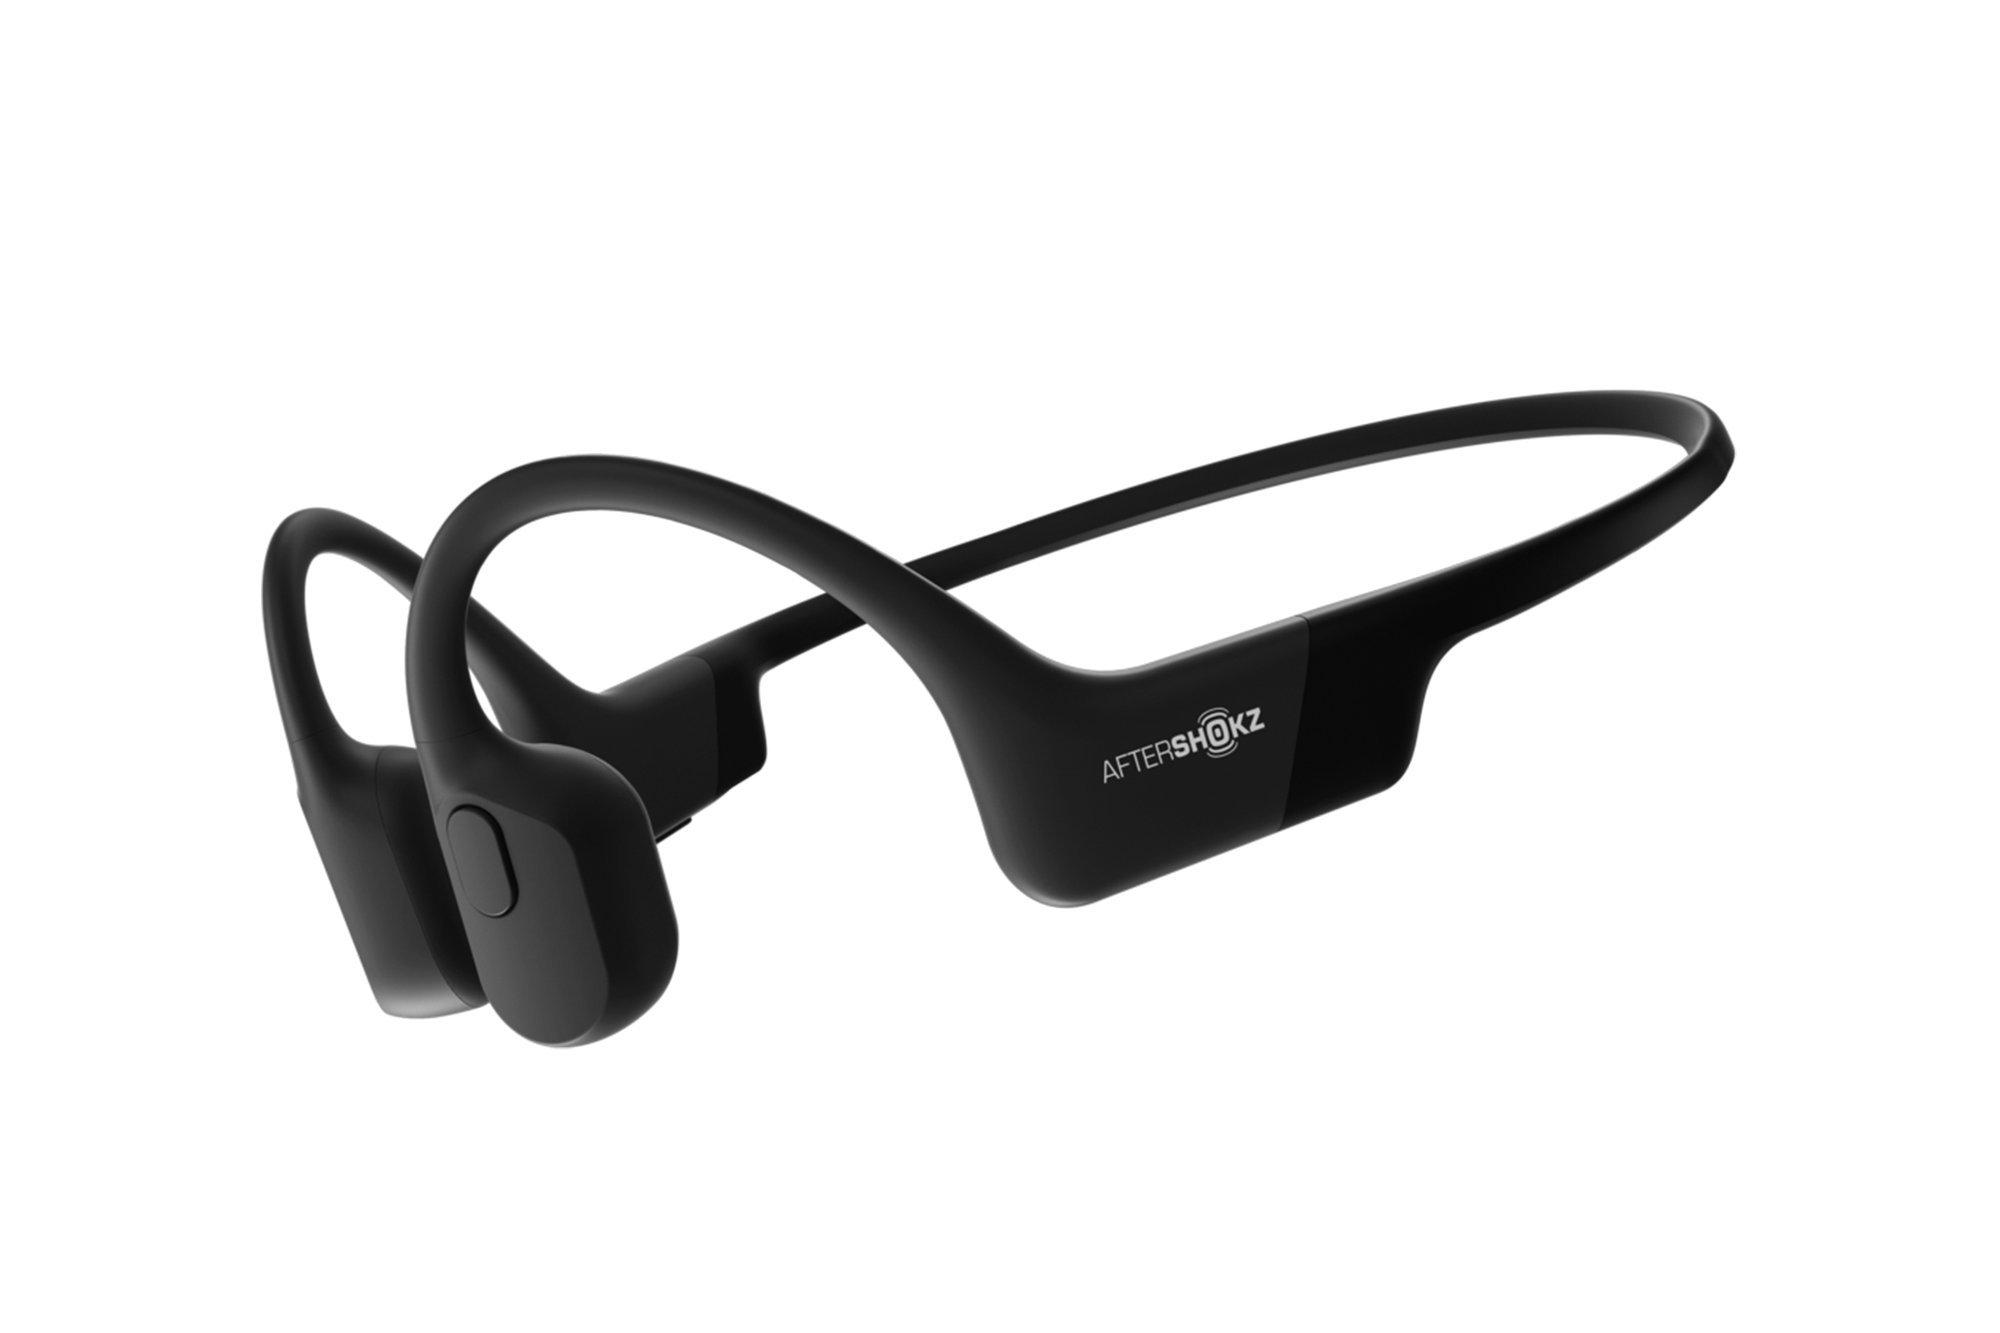 New Wireless Bone Conduction Headphones Aeropex AfterShokz AS800 Cosmic Black